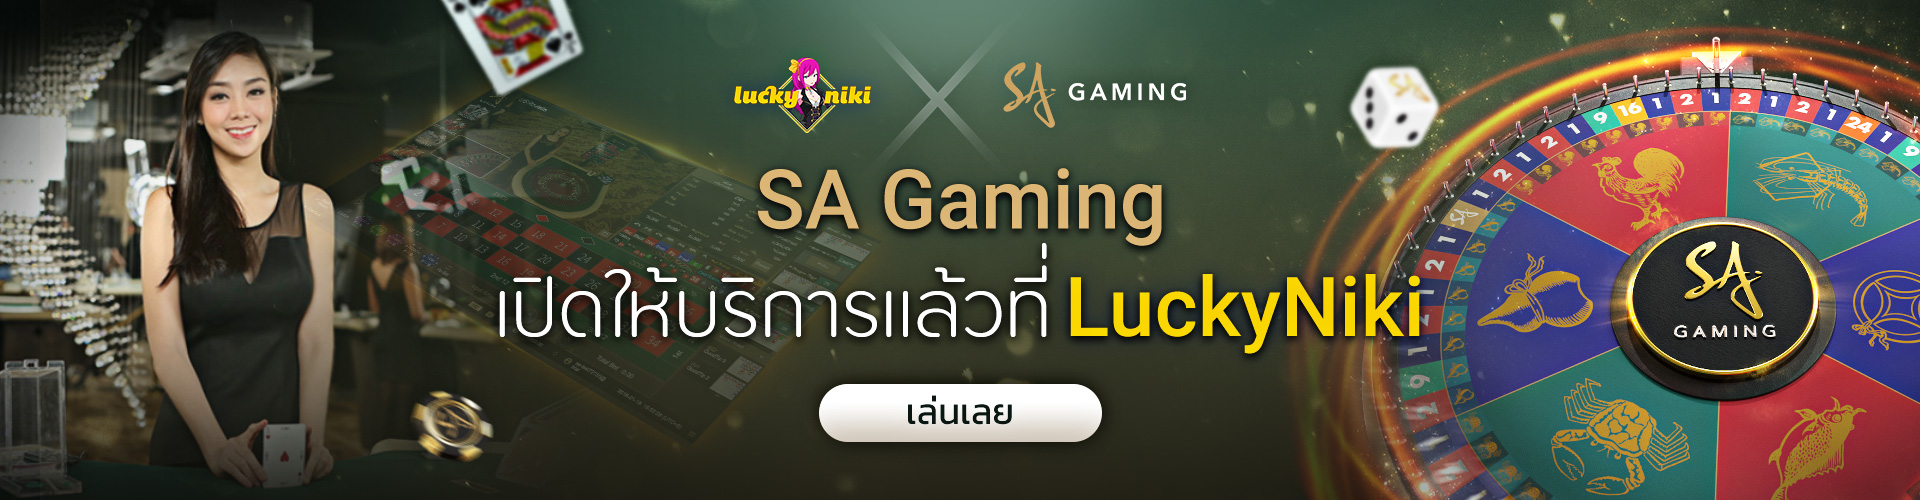 SA Gaming เปิดให้บริการแล้ววันนี้ที่ LuckyNiki